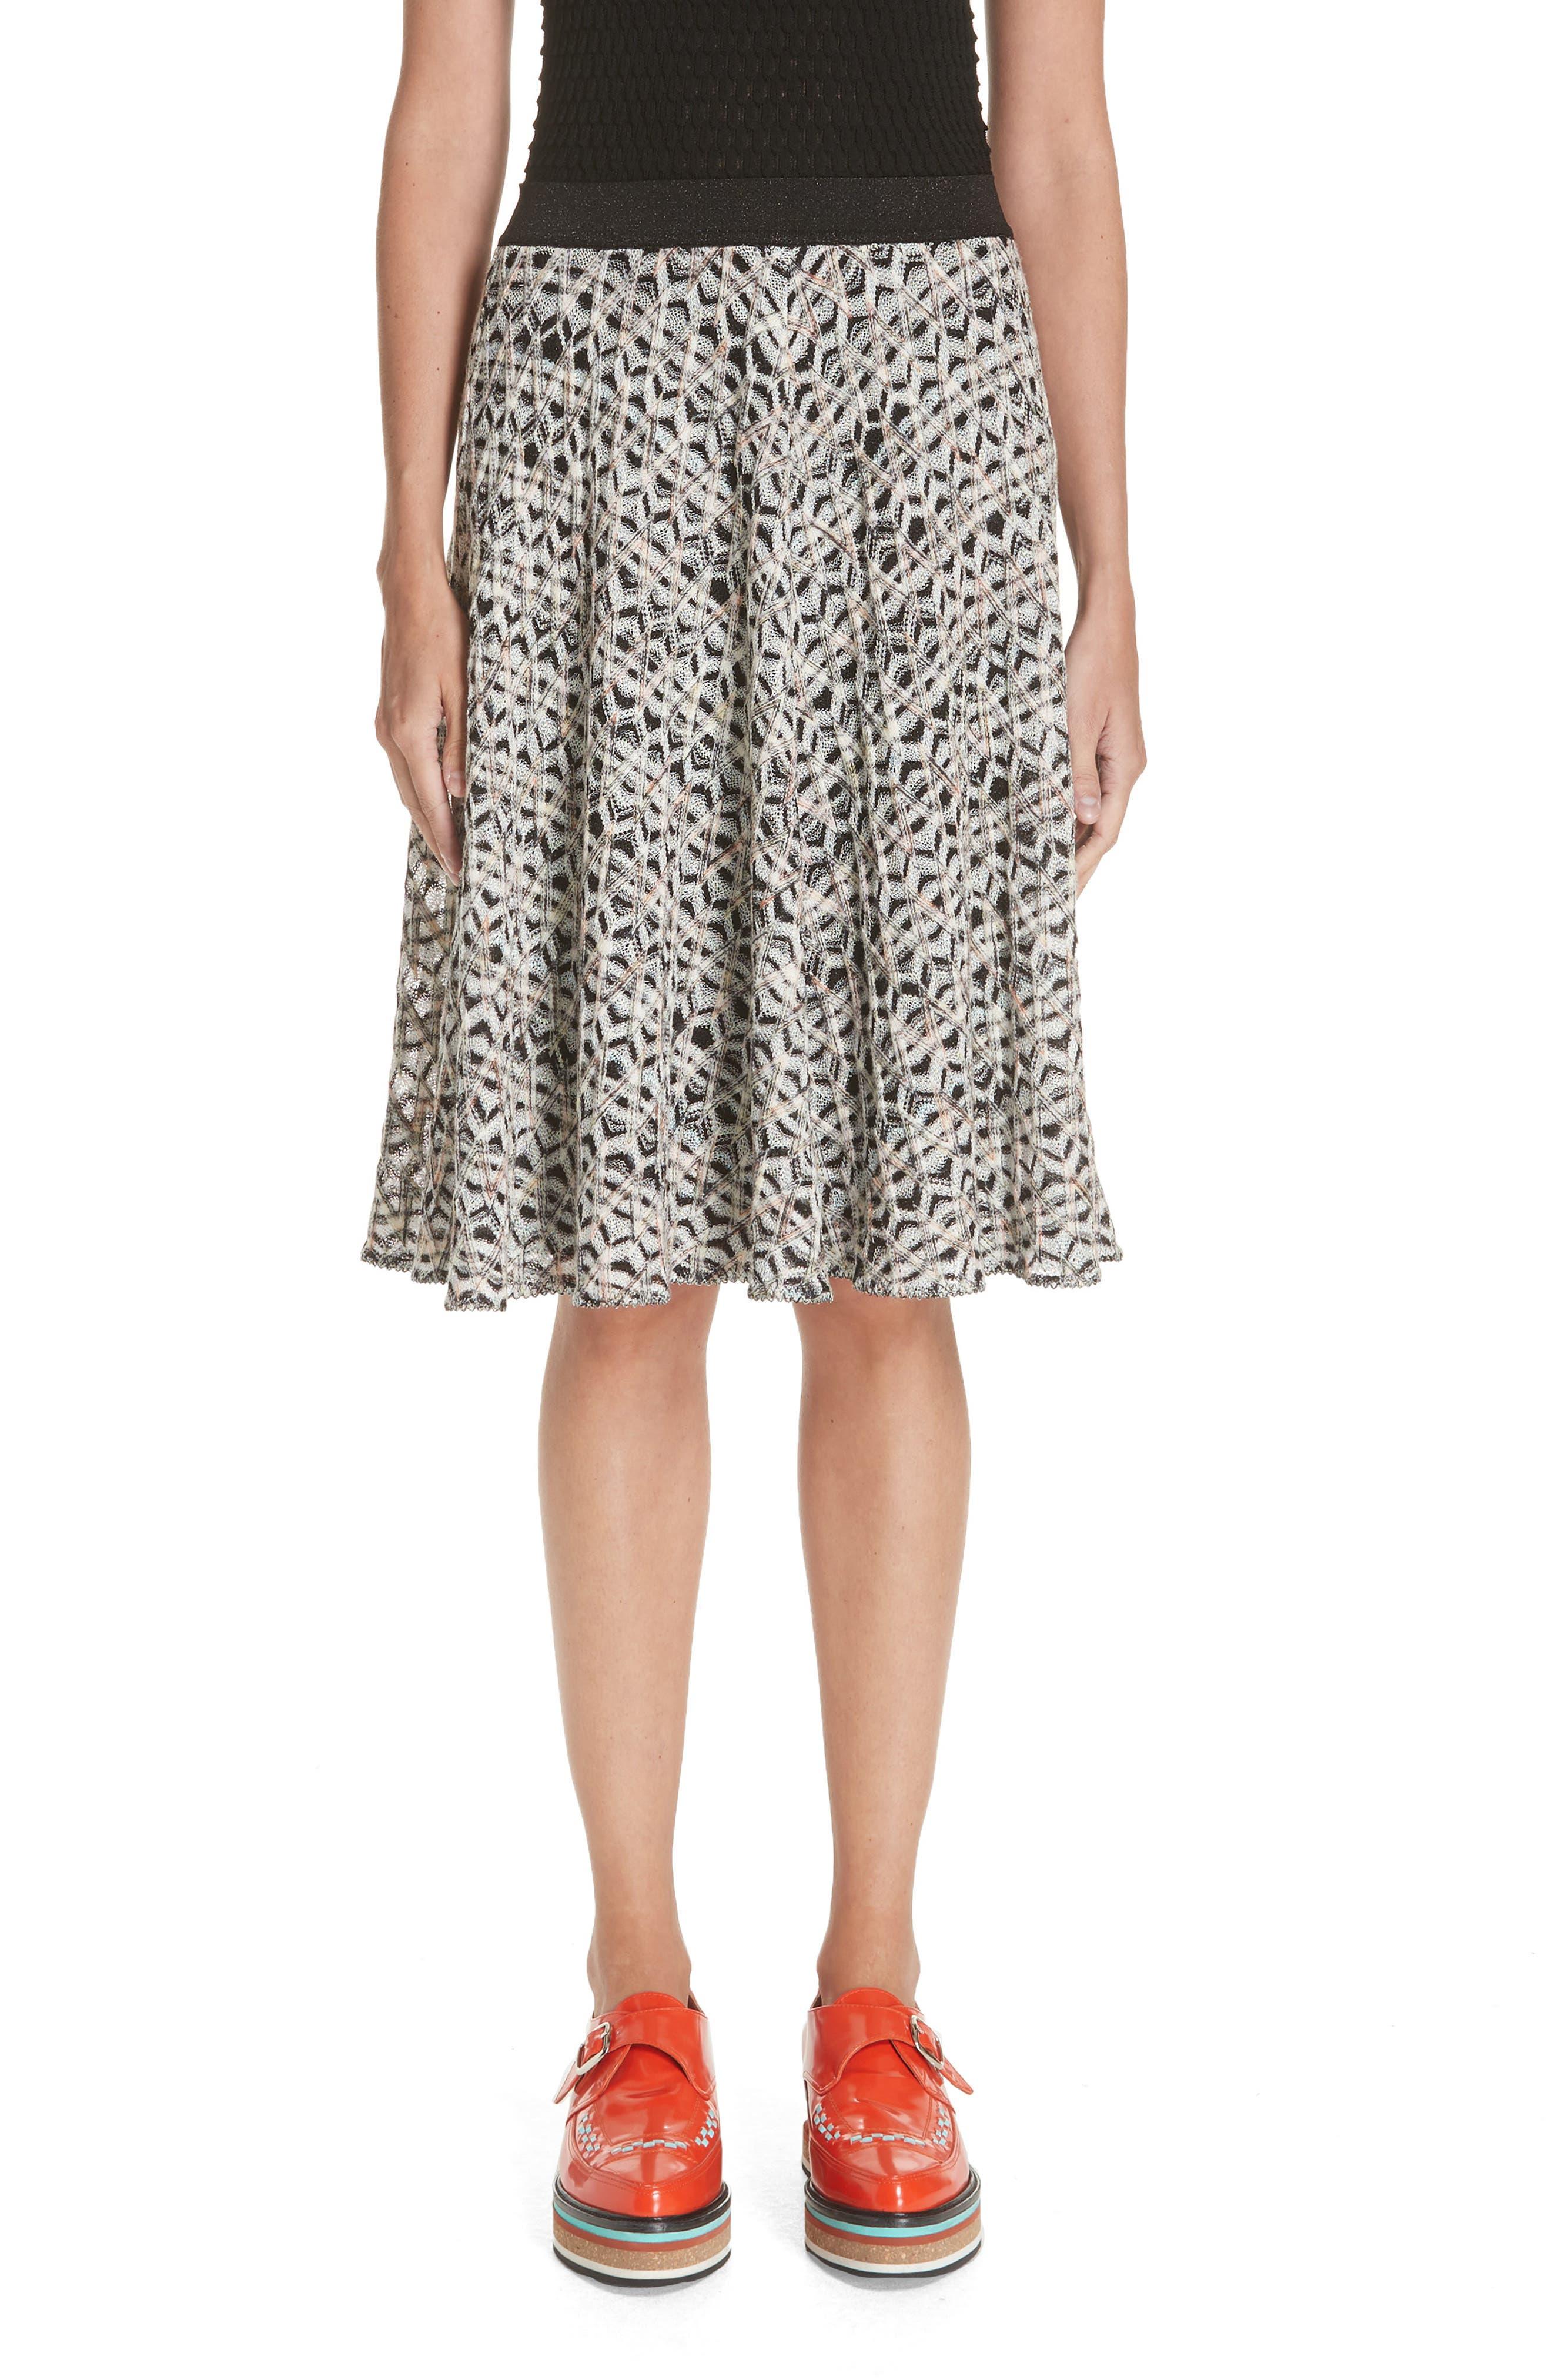 MISSONI, Zig Zag A-Line Skirt, Main thumbnail 1, color, MULTI